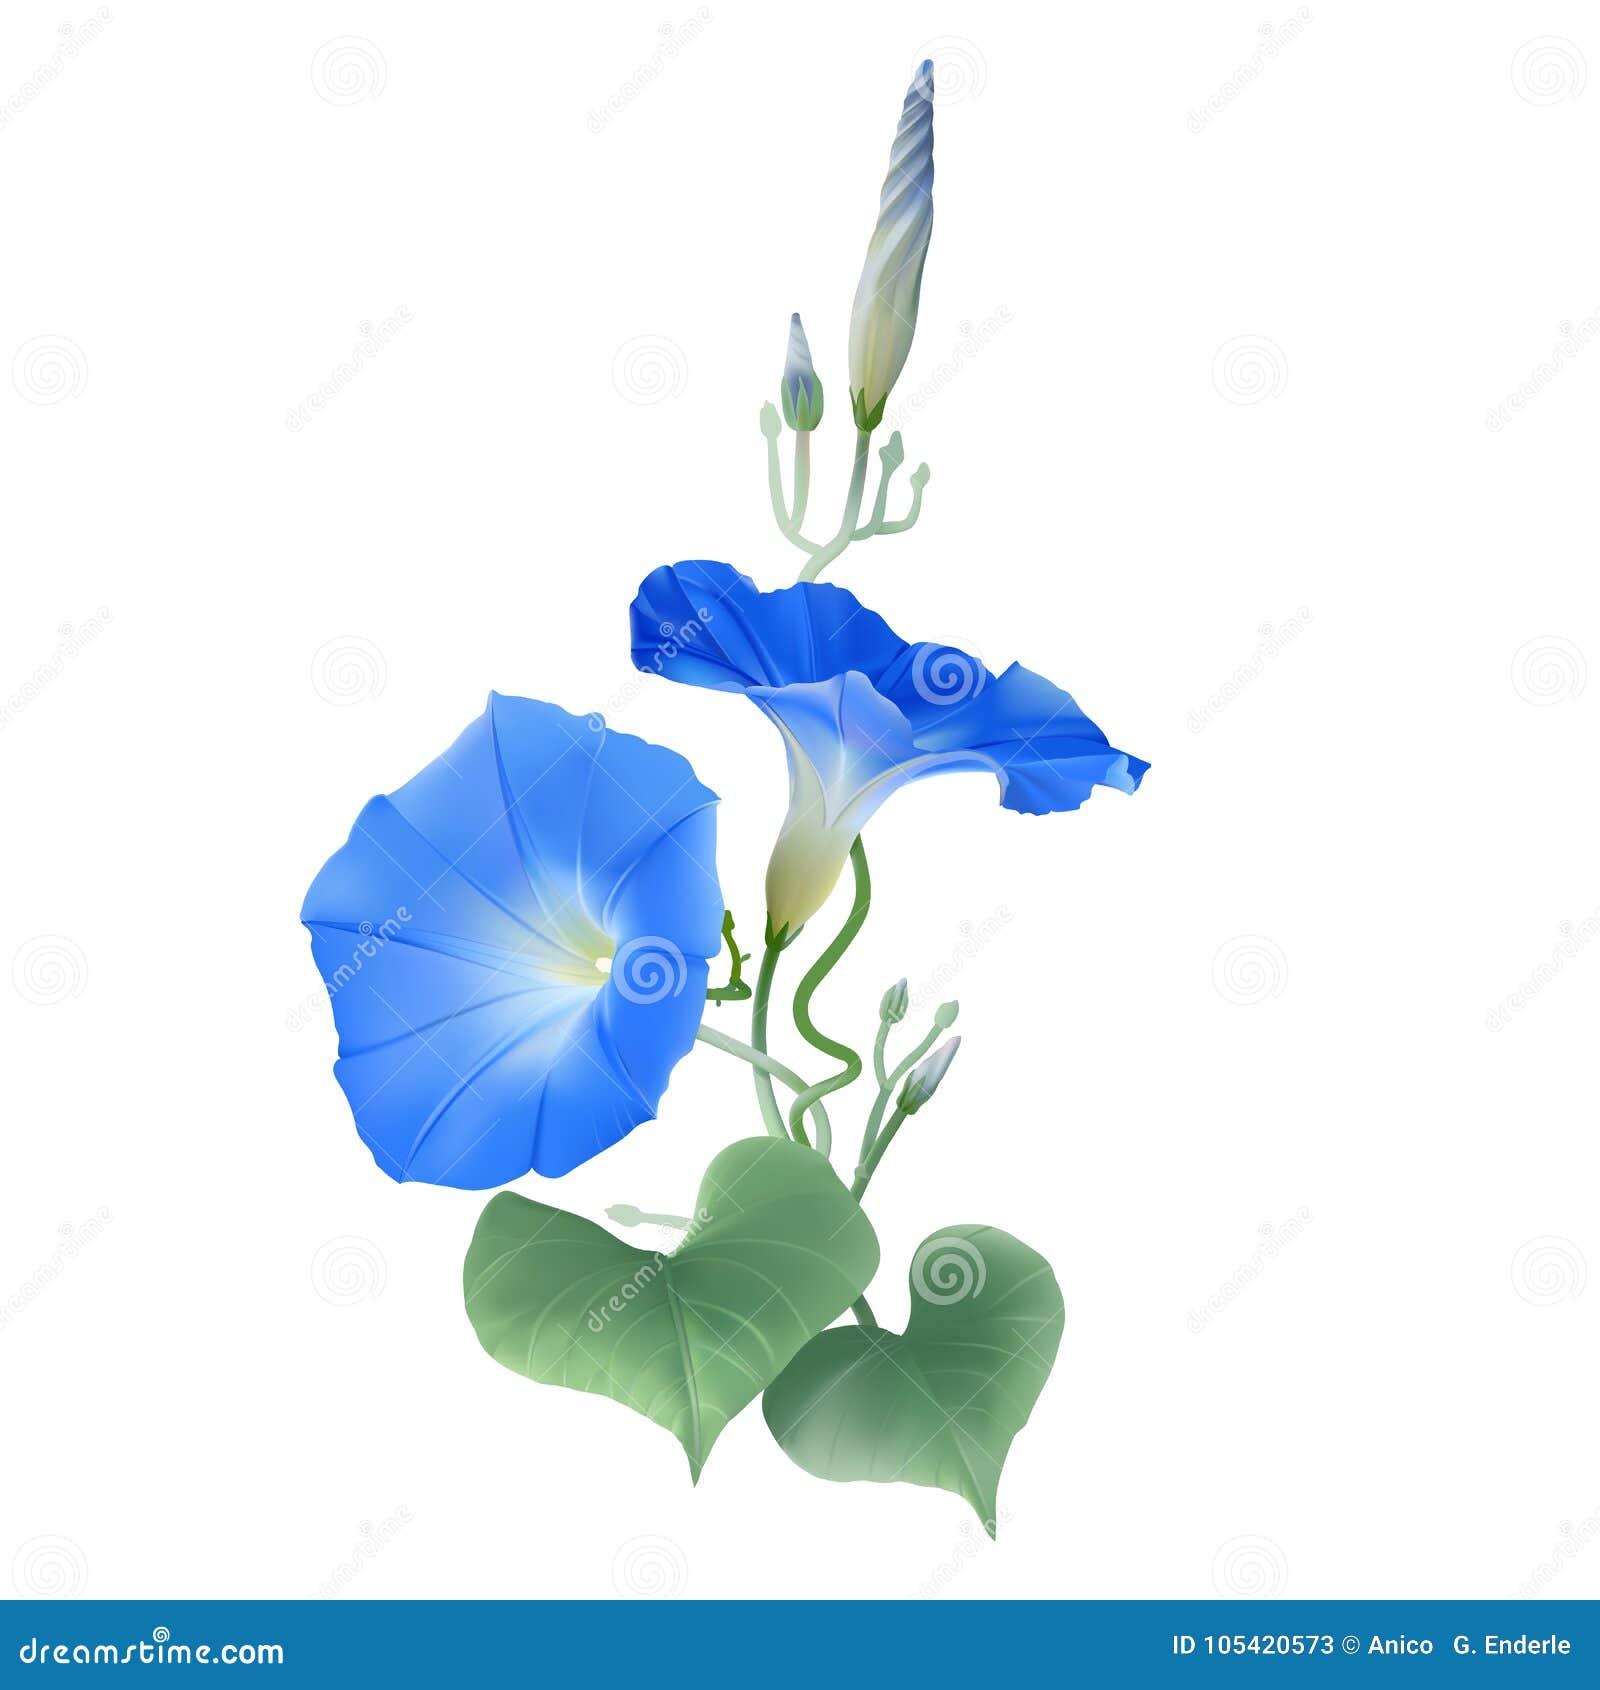 Manhã Glory Heavenly Blue